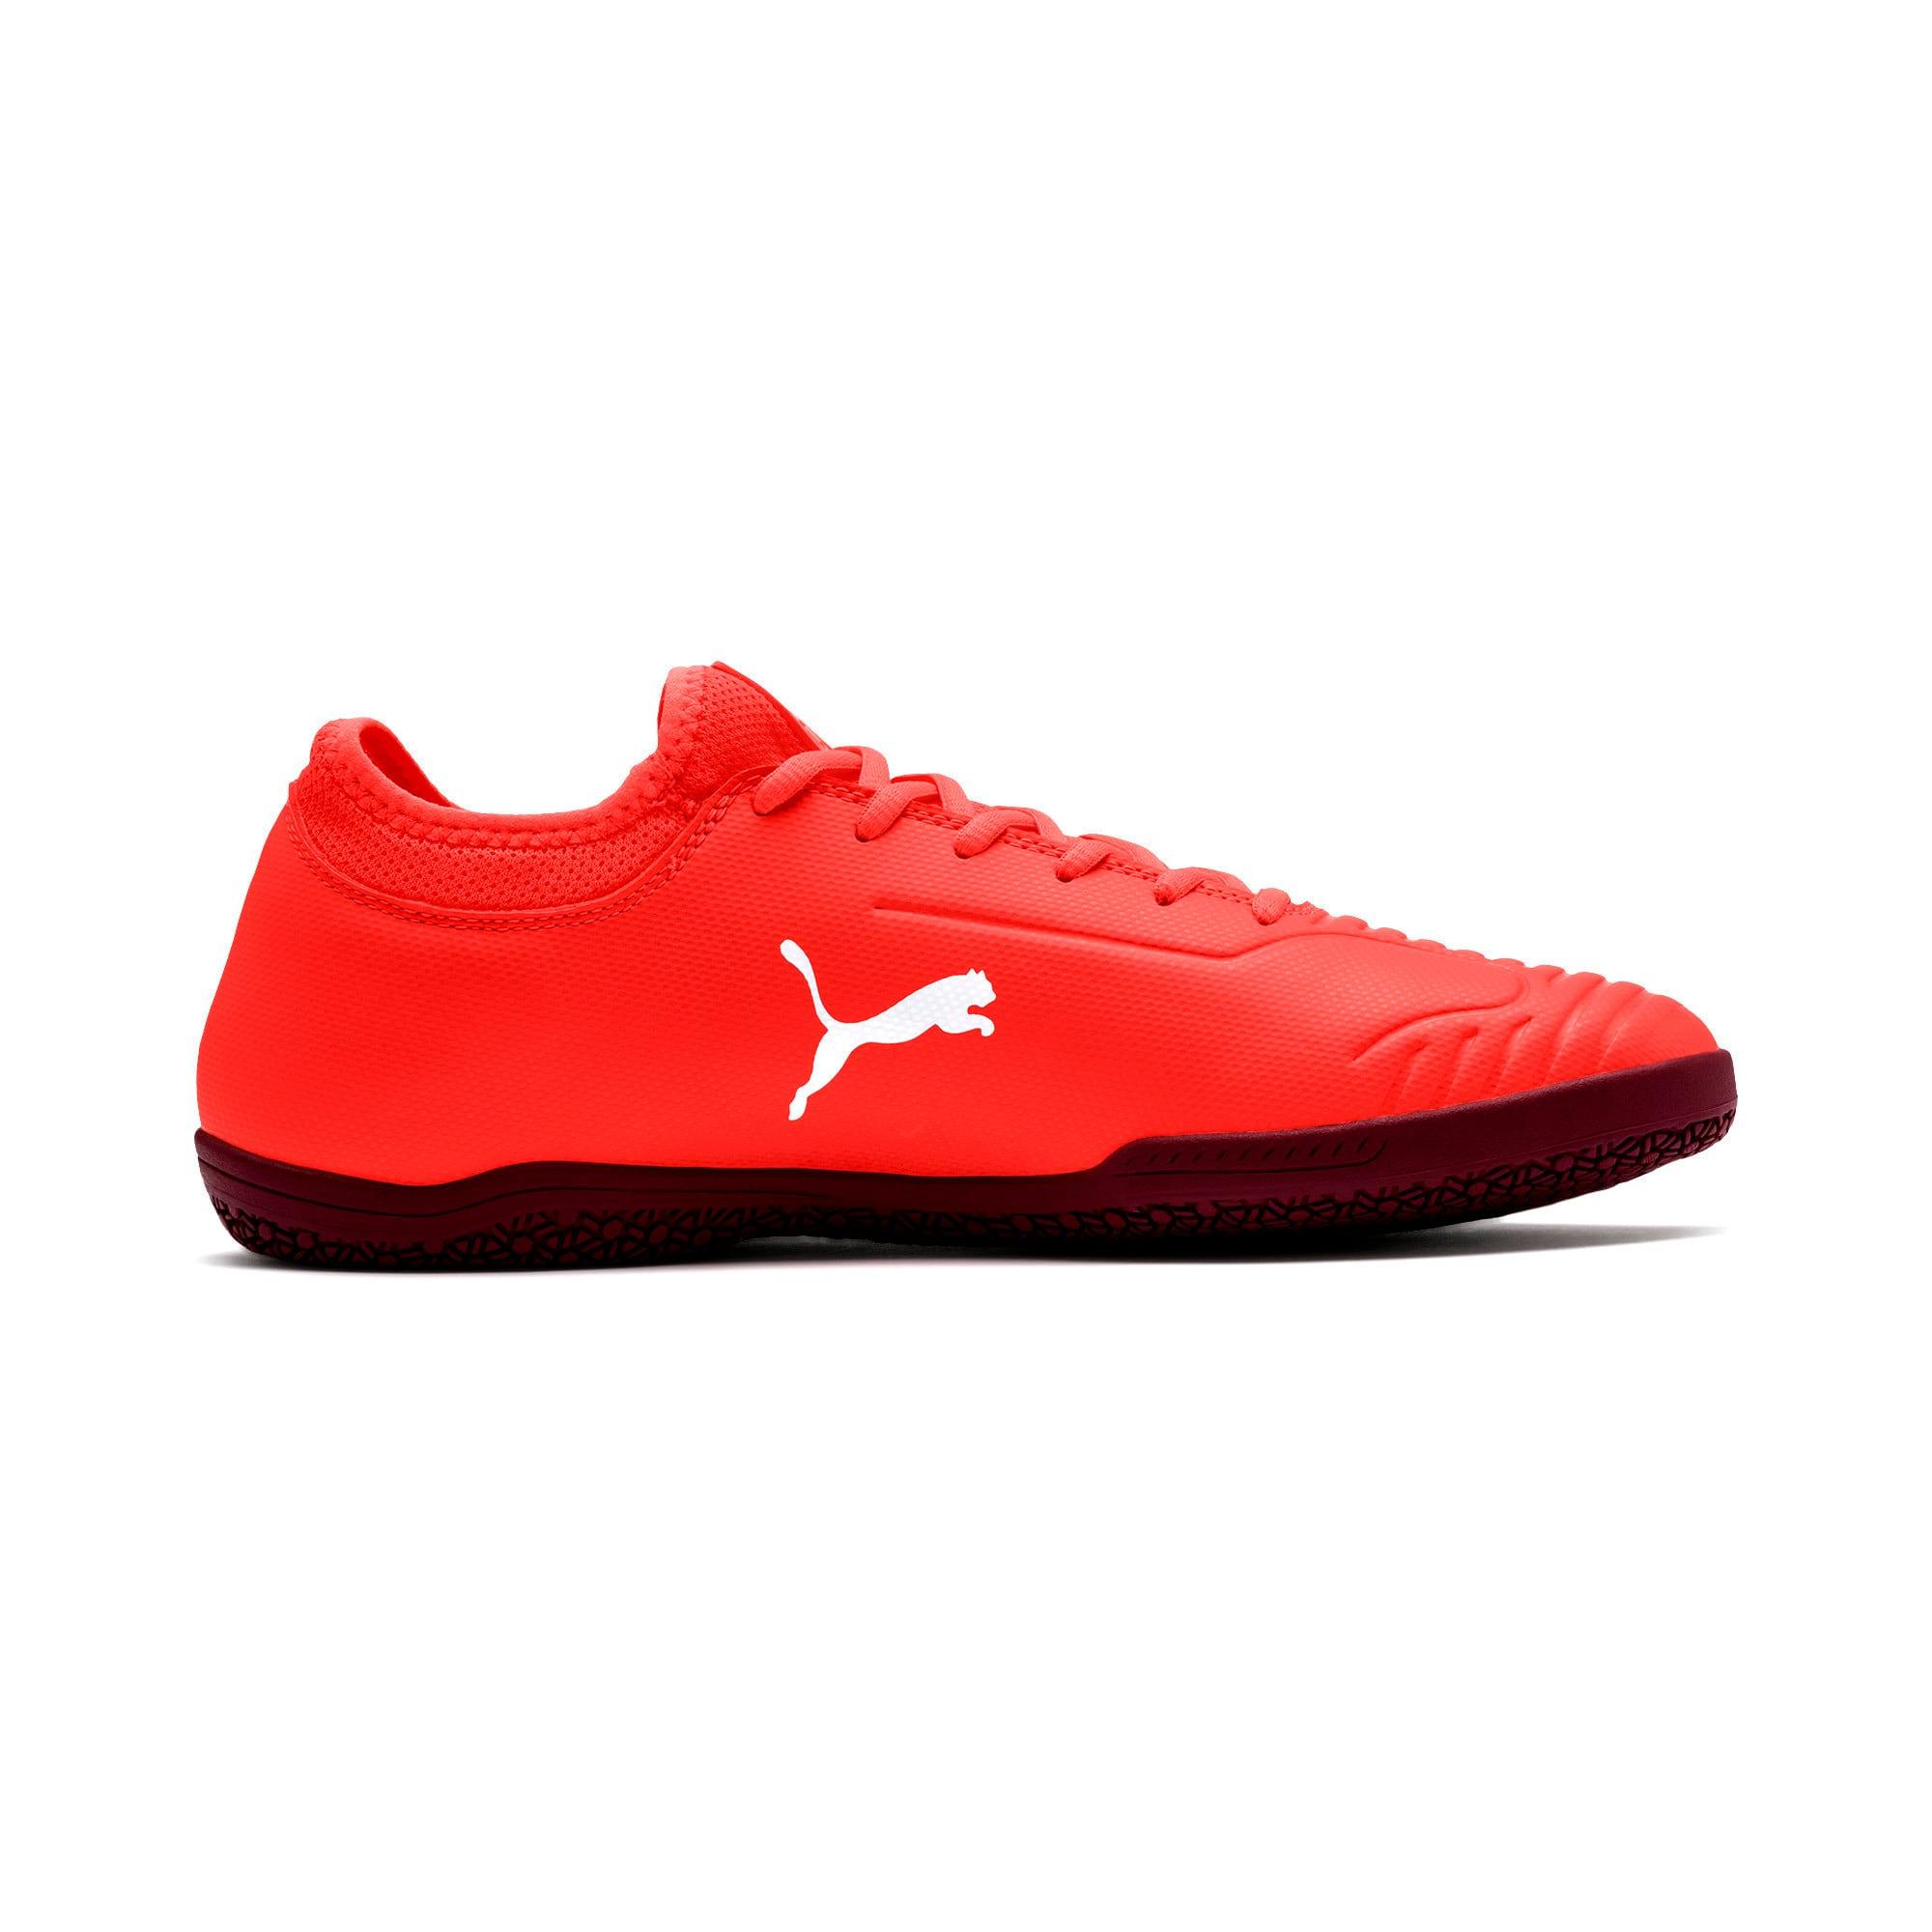 Thumbnail 6 of 365 Sala 2 Men's Soccer Shoes, Nrgy Red-Rhubarb, medium